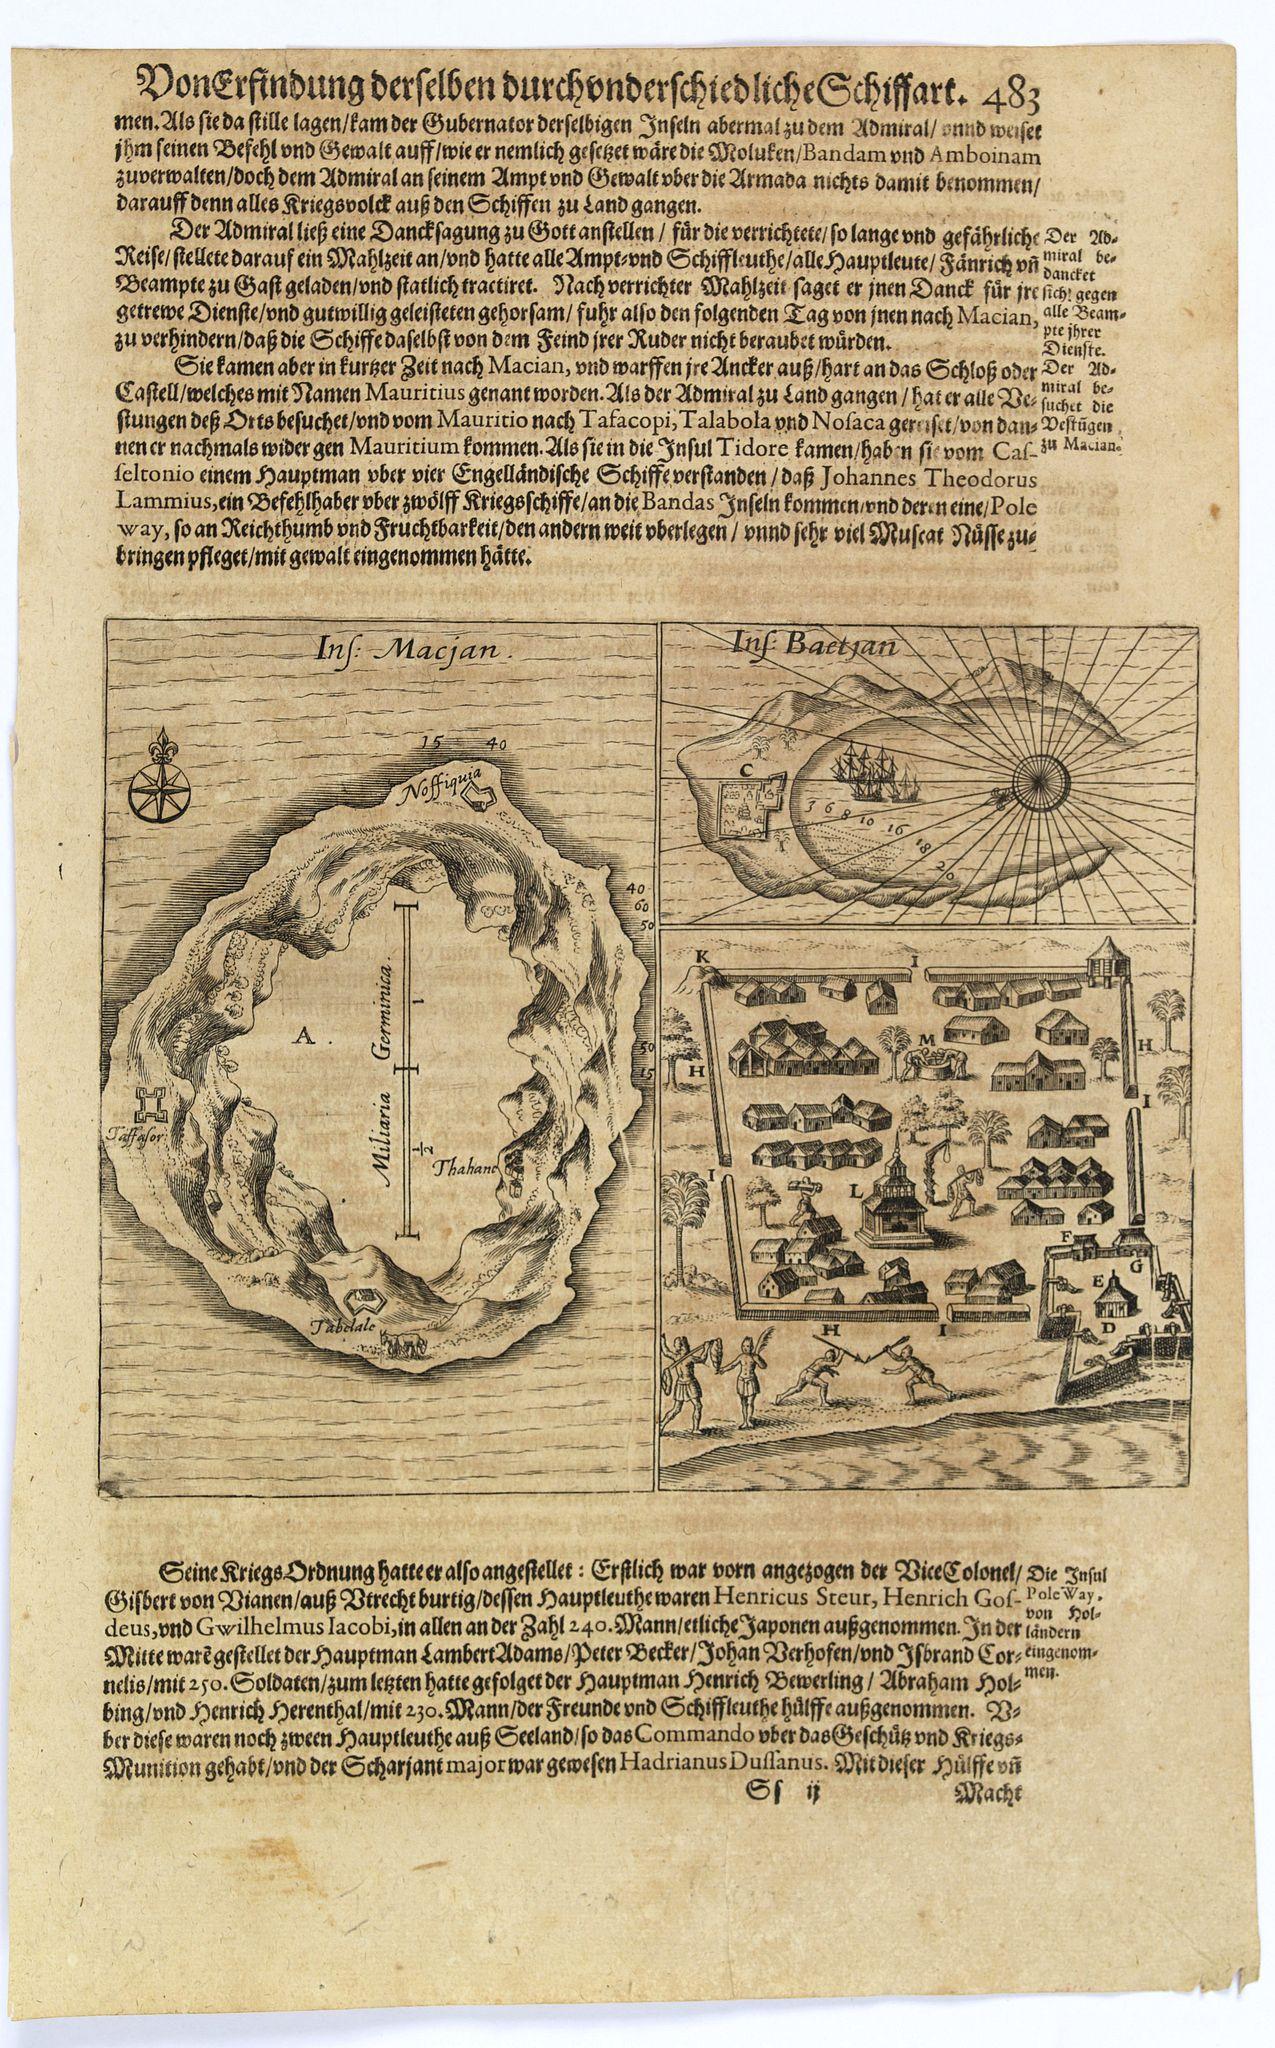 GOTTFRIED, J.L. / DE BRY. -  [Islands of Macian and Bacian.]